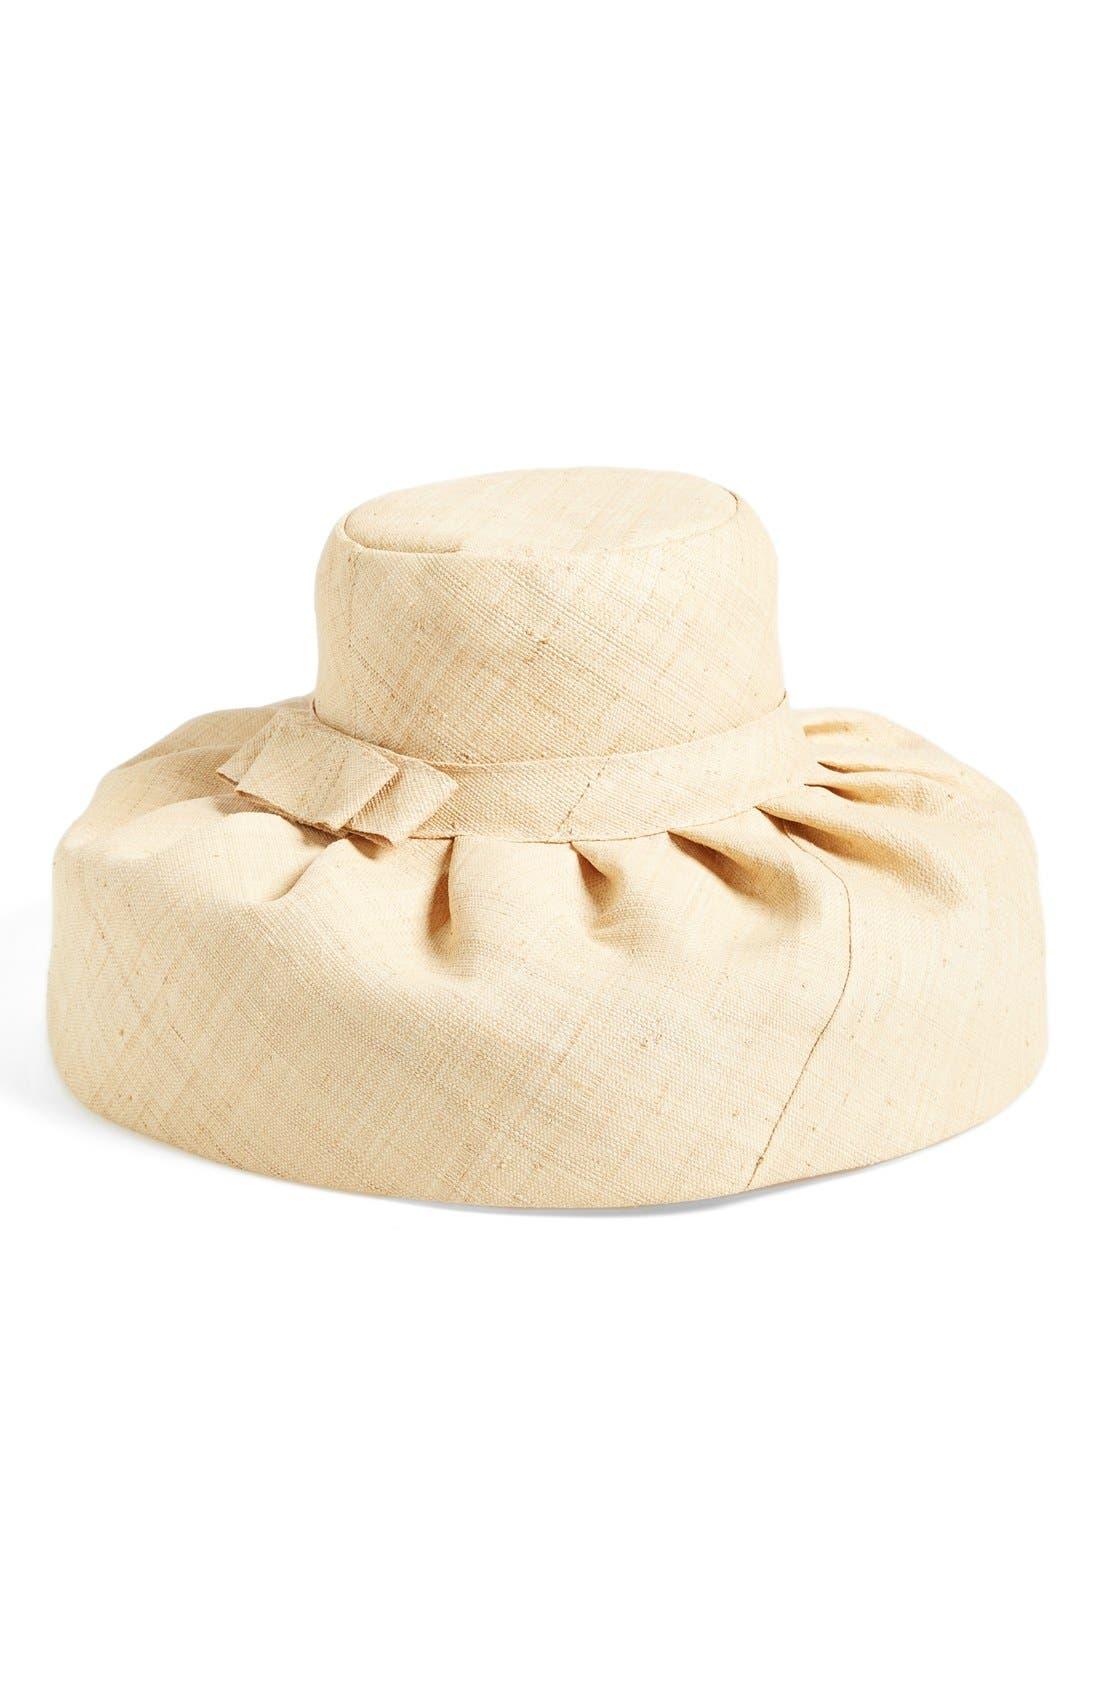 Alternate Image 1 Selected - PilyQ Sun Hat